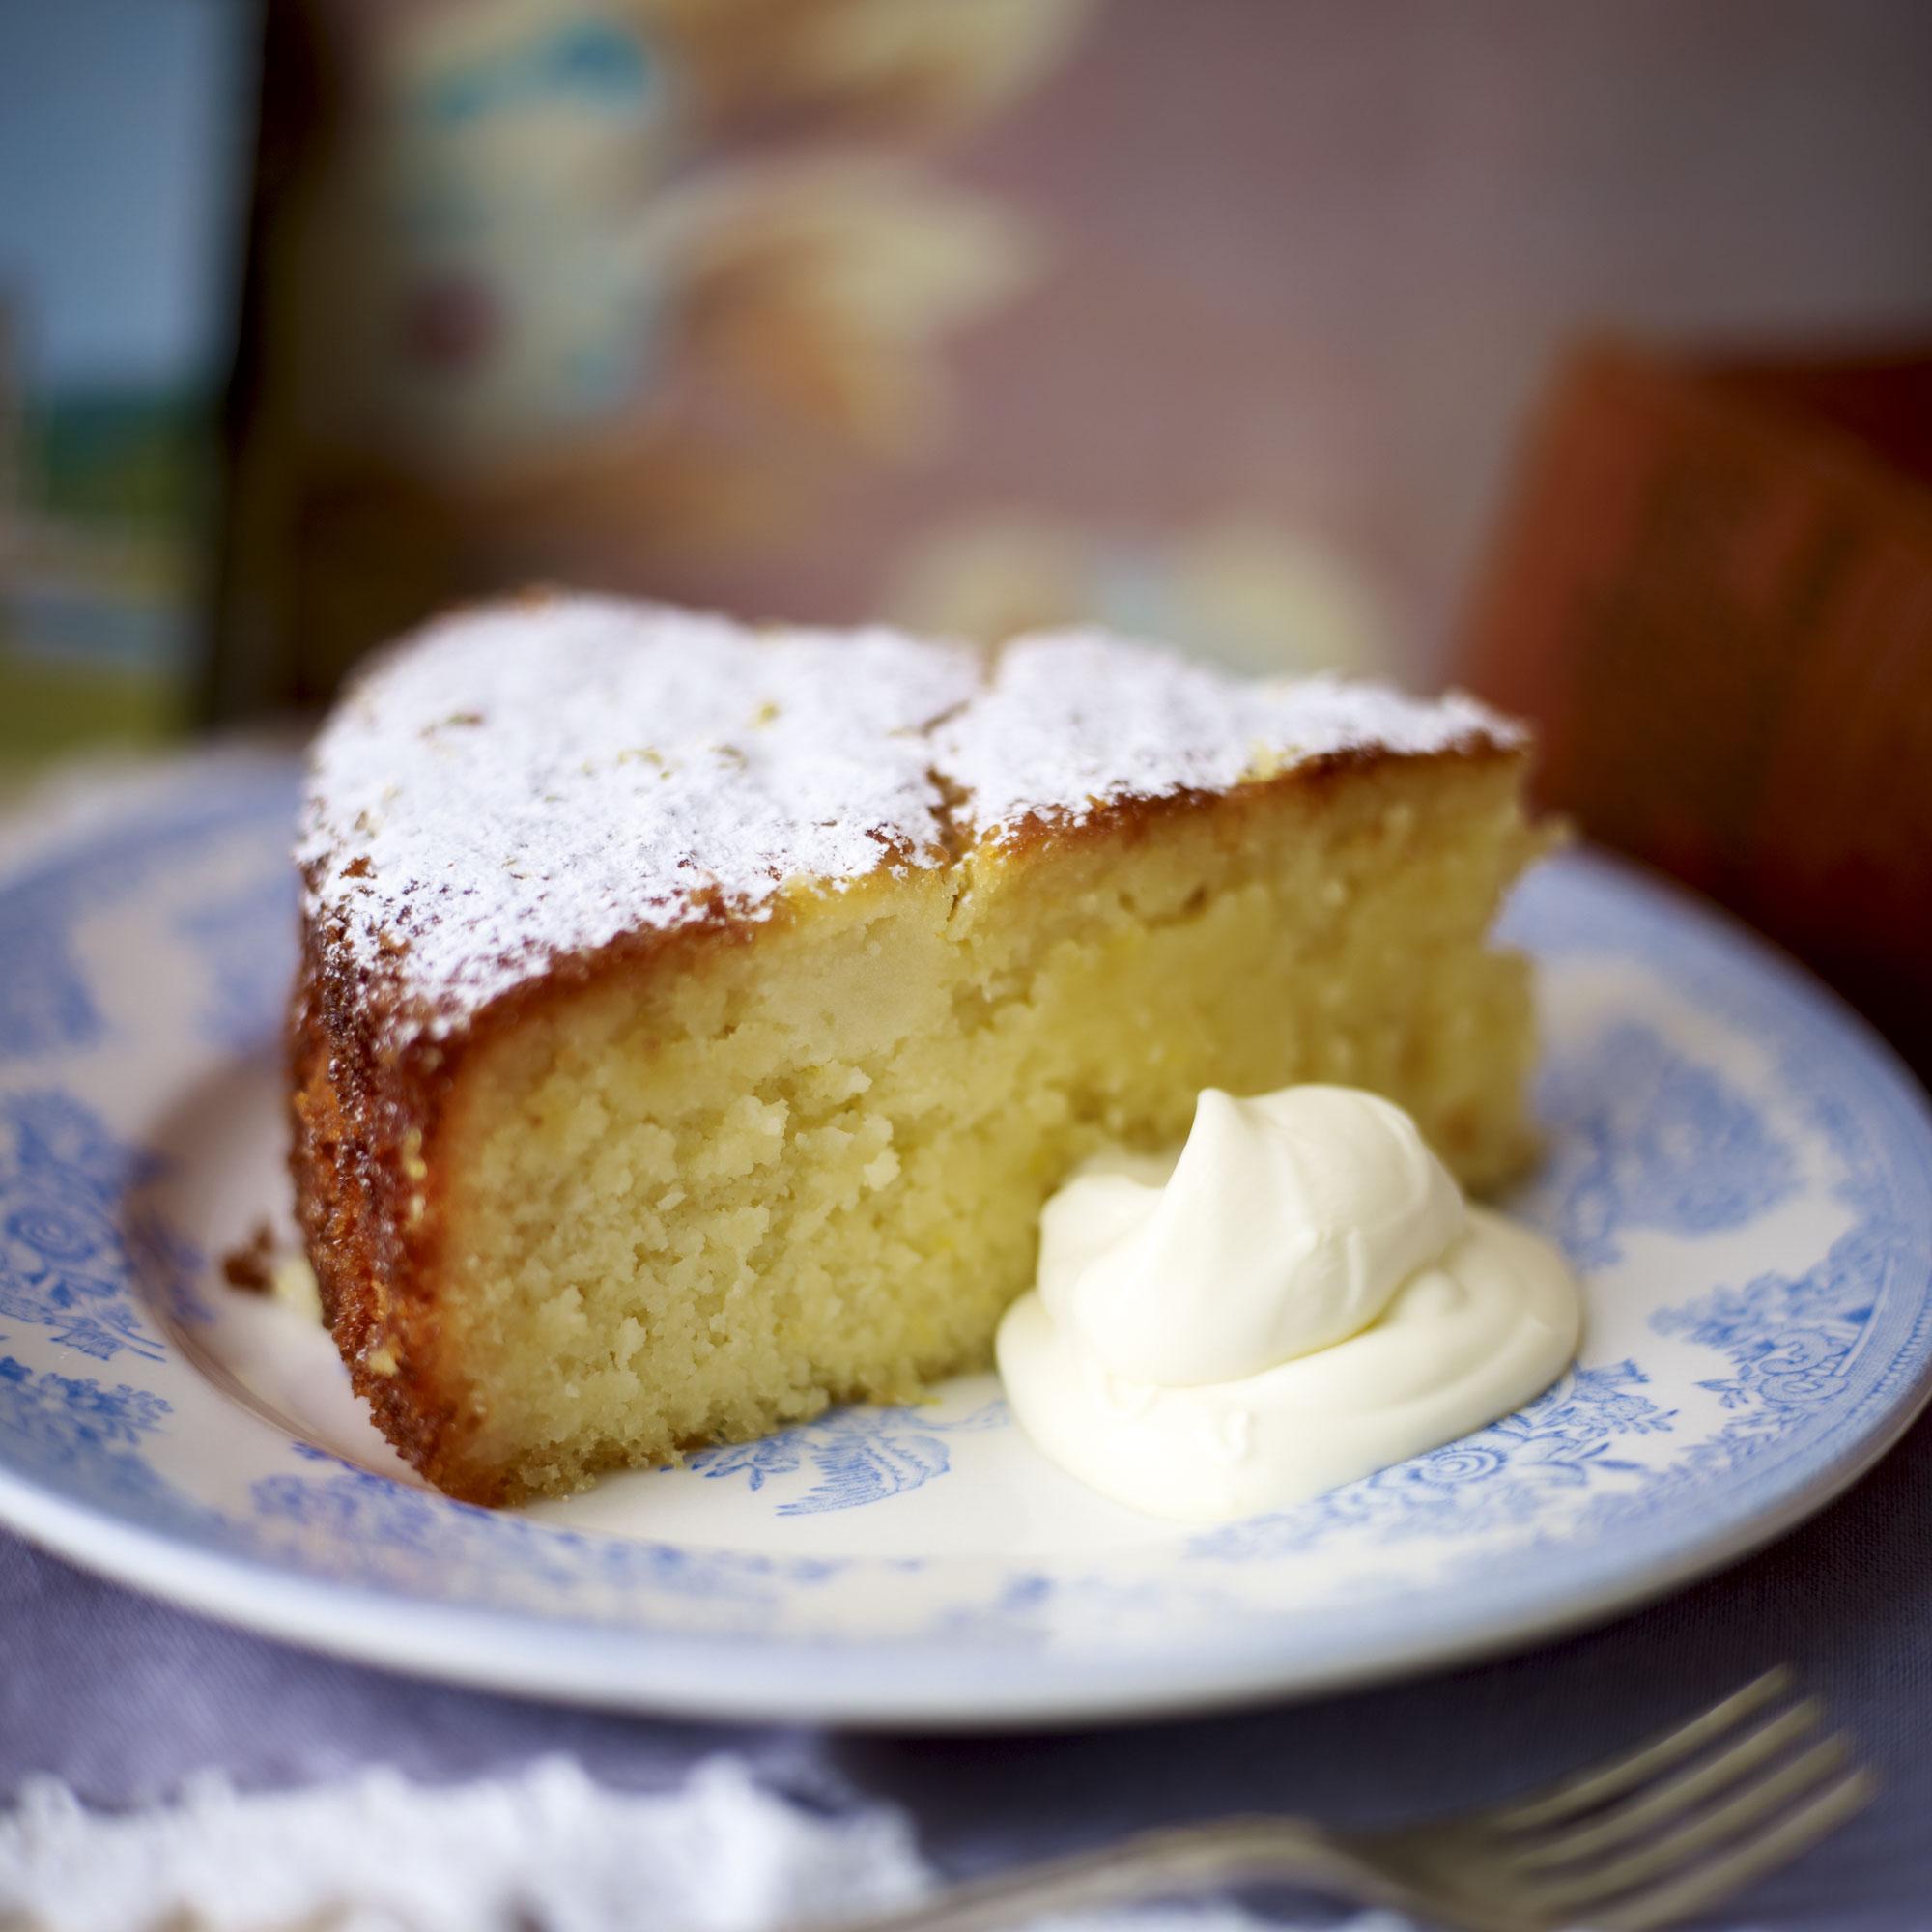 Gluten free lemon cake recipes from scratch